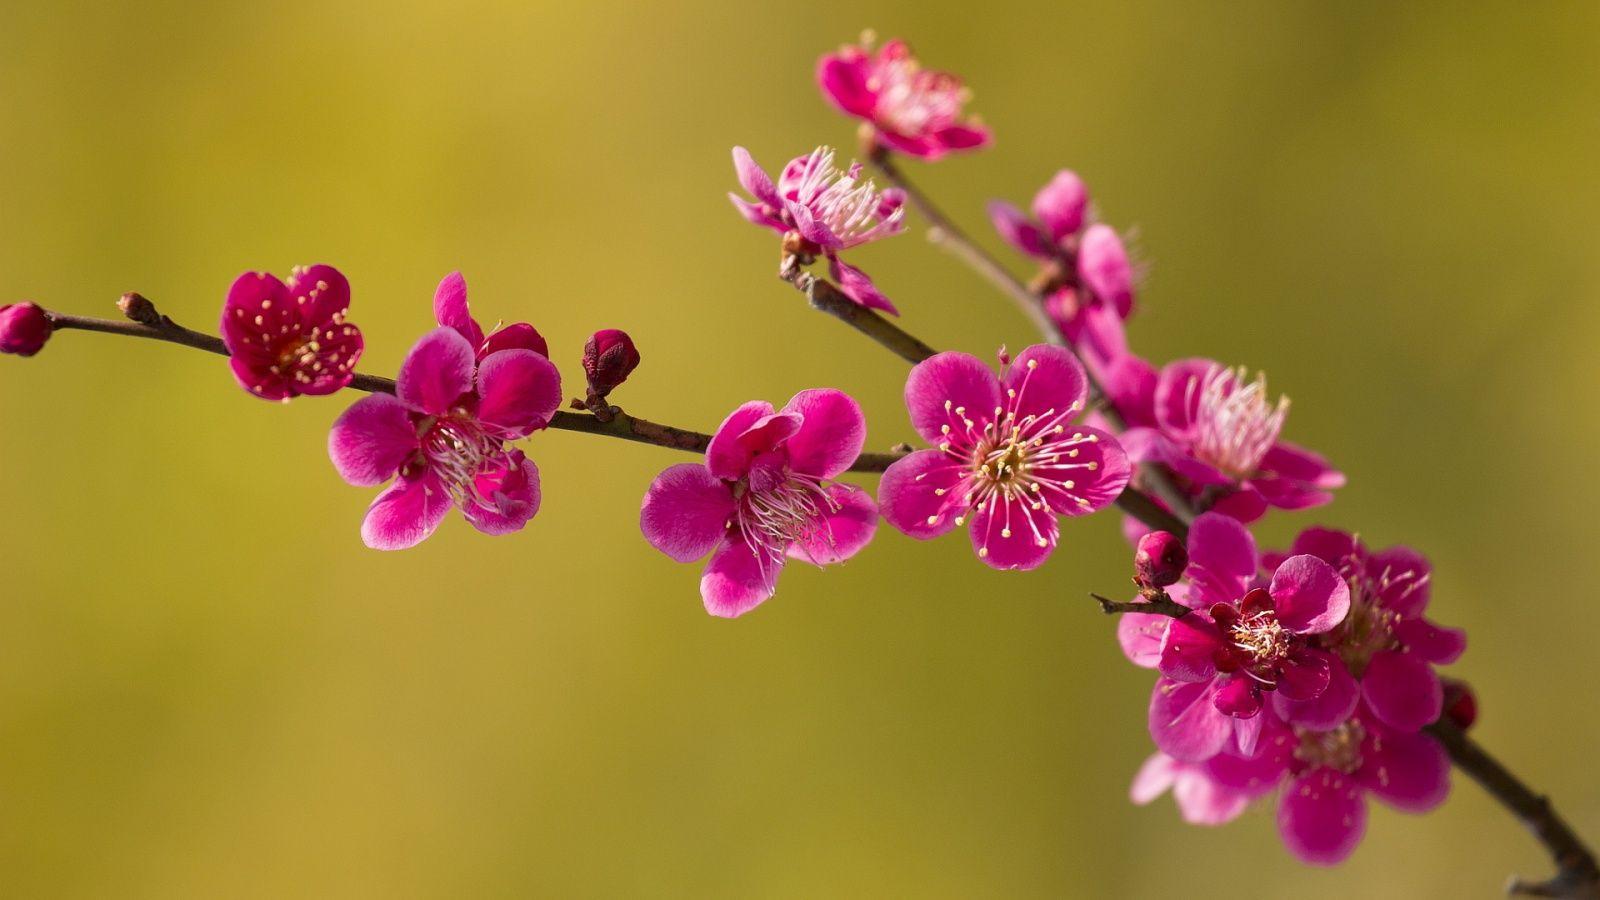 1600x900 Pink Spring Blossoms Wallpaper Pink Spring Spring